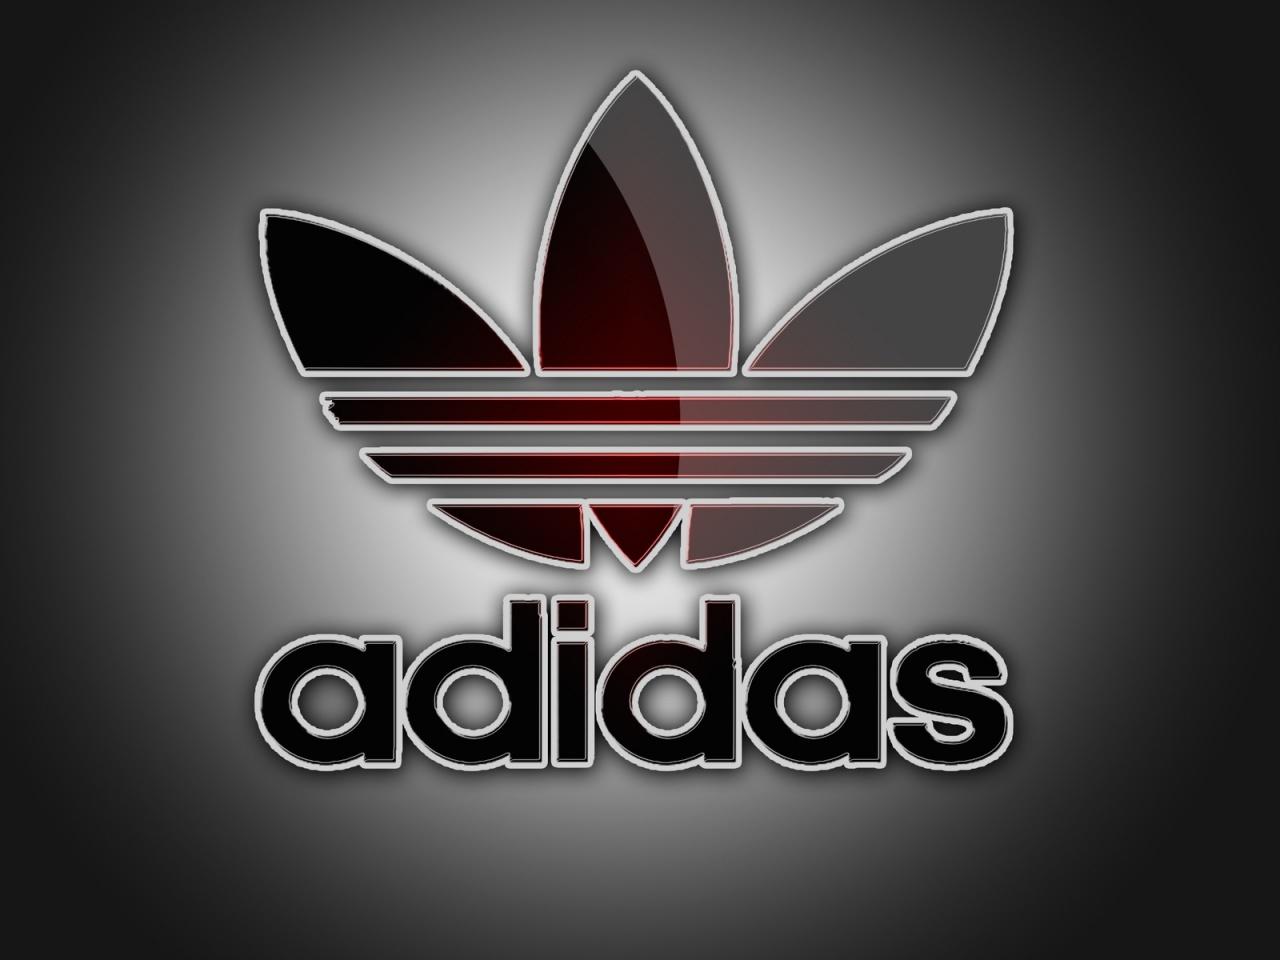 Cool logo Wallpaper